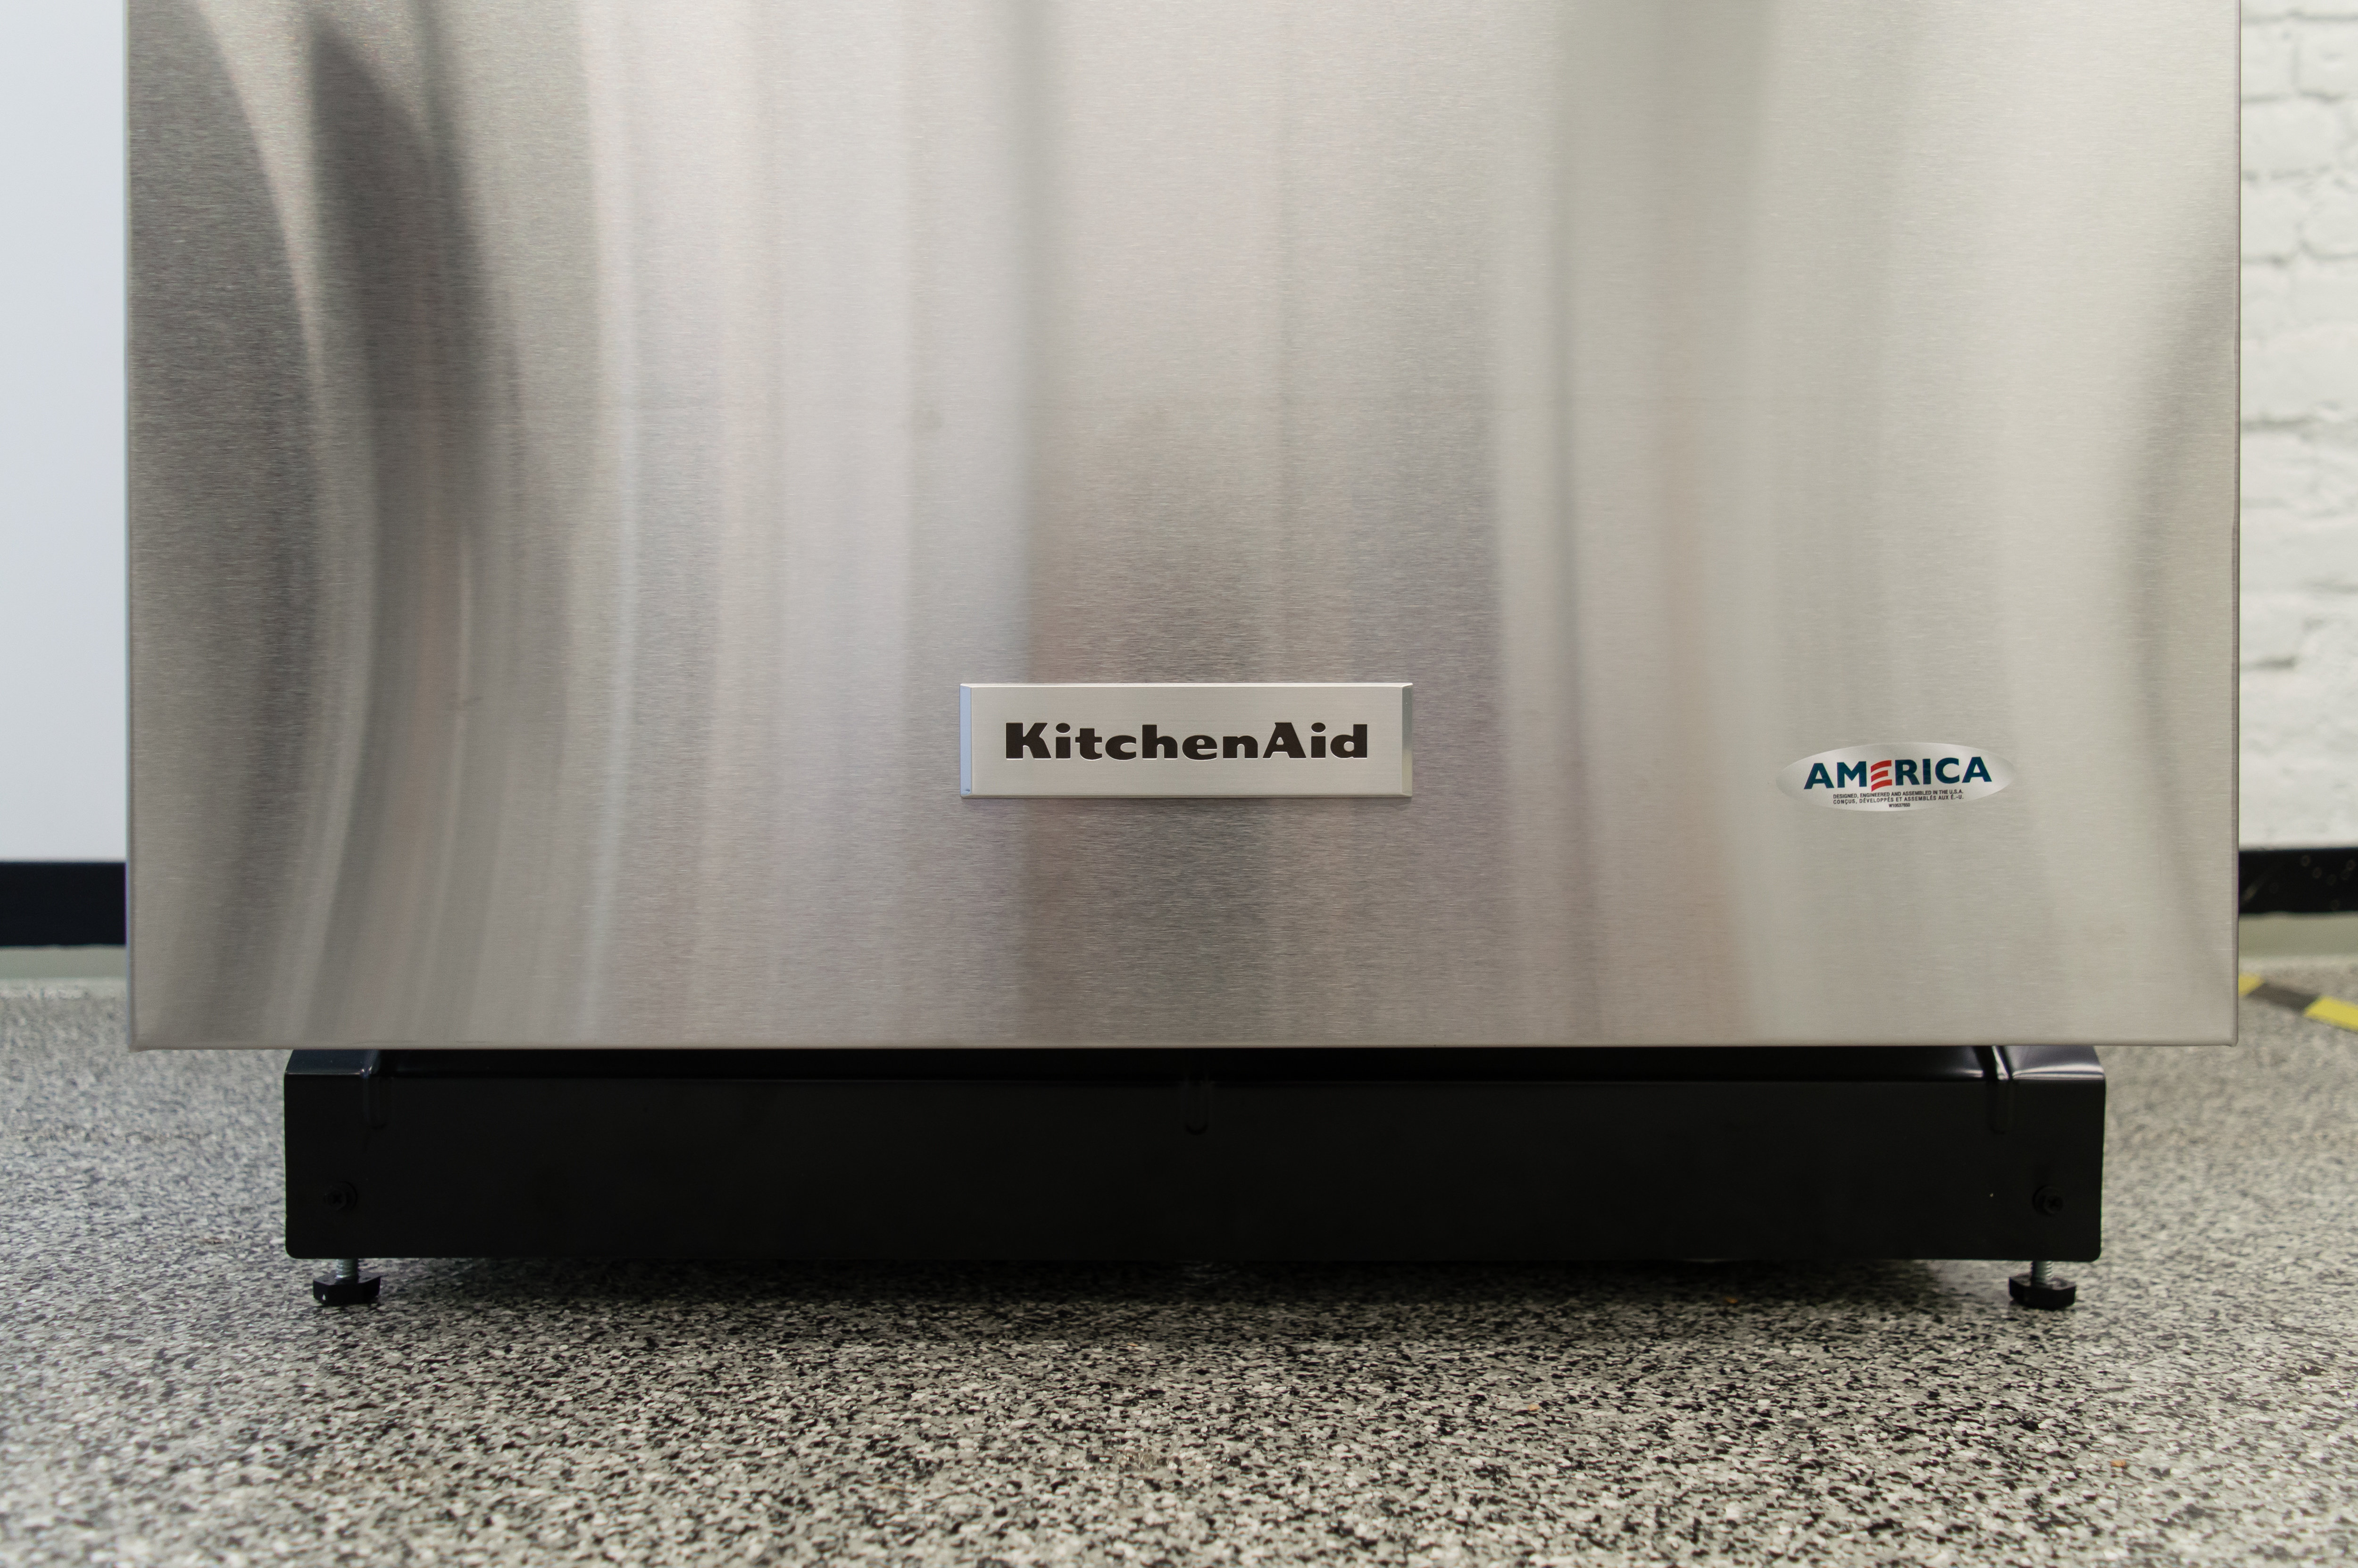 KitchenAid KDTM404ESS KitchenAid Emblem